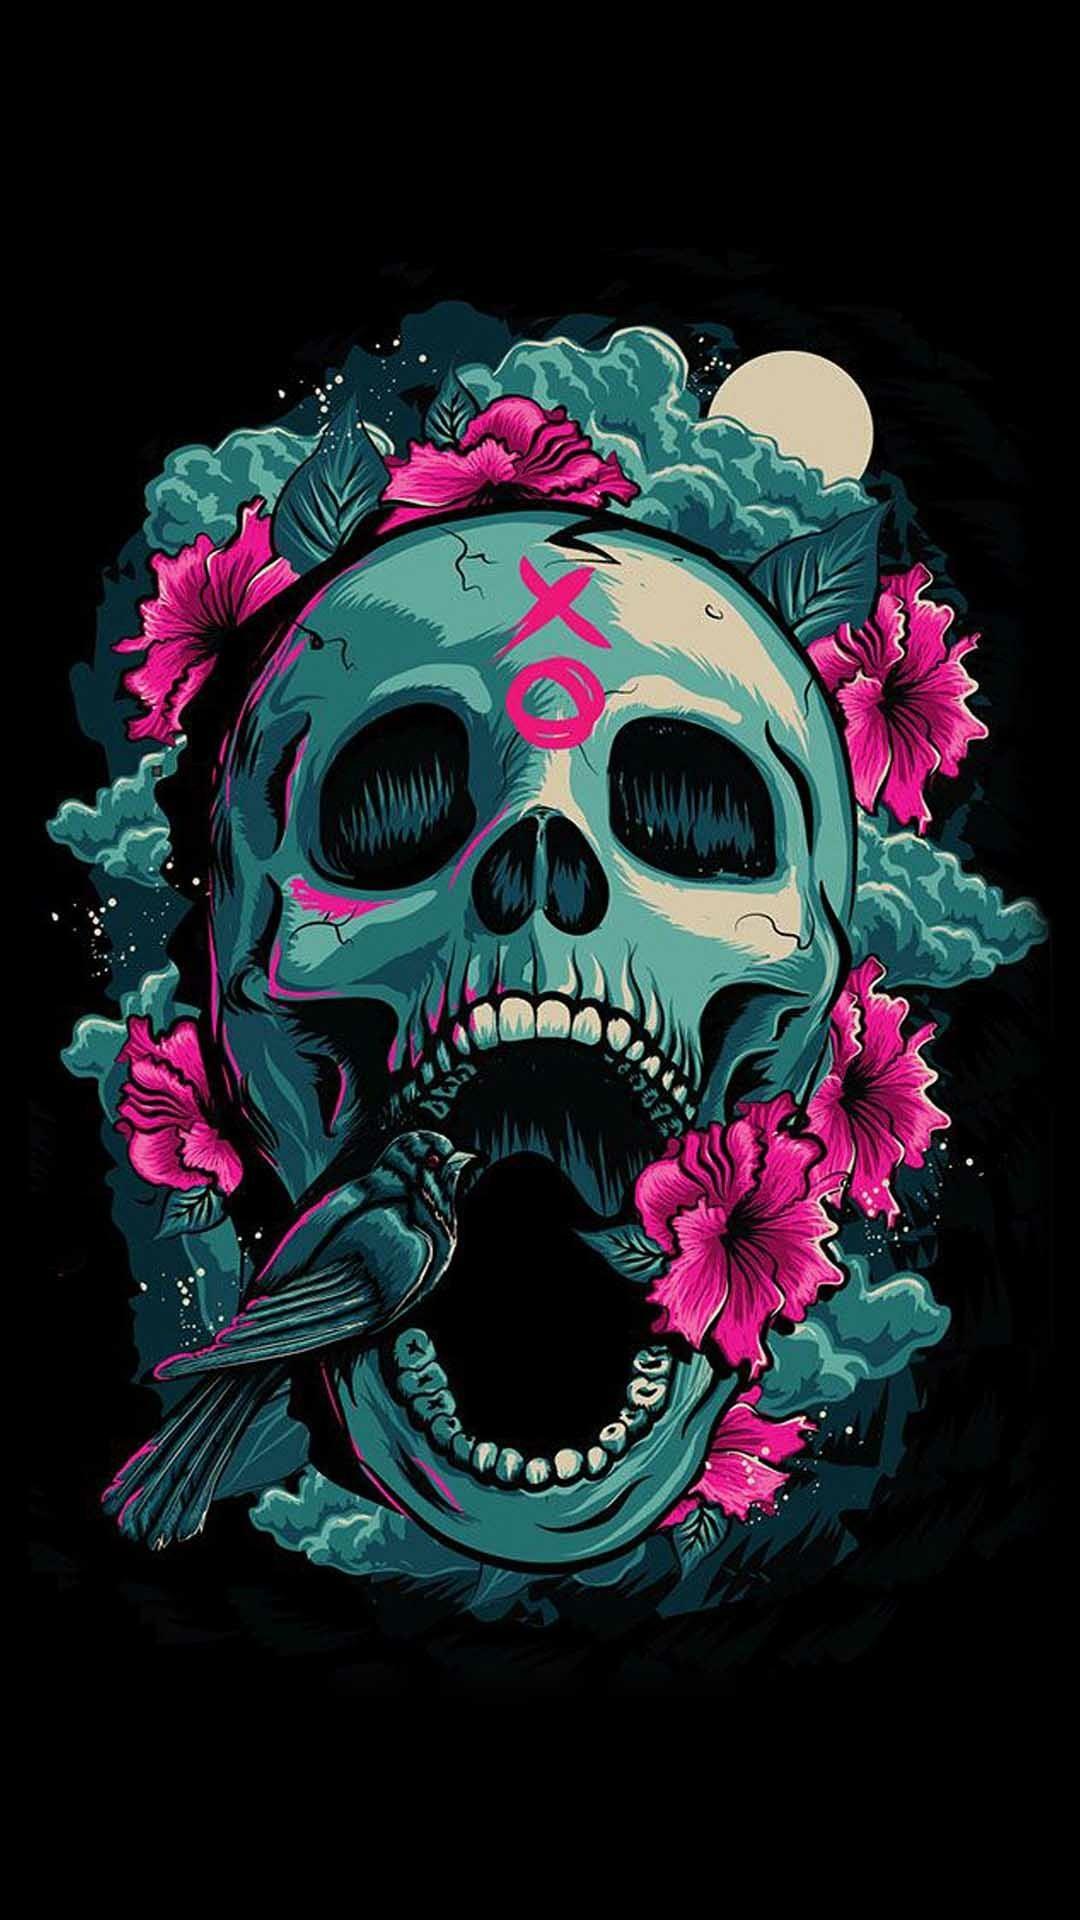 Skullcandy Iphone Wallpaper Sugar Skull Wallpaper For Iphone 62 Images